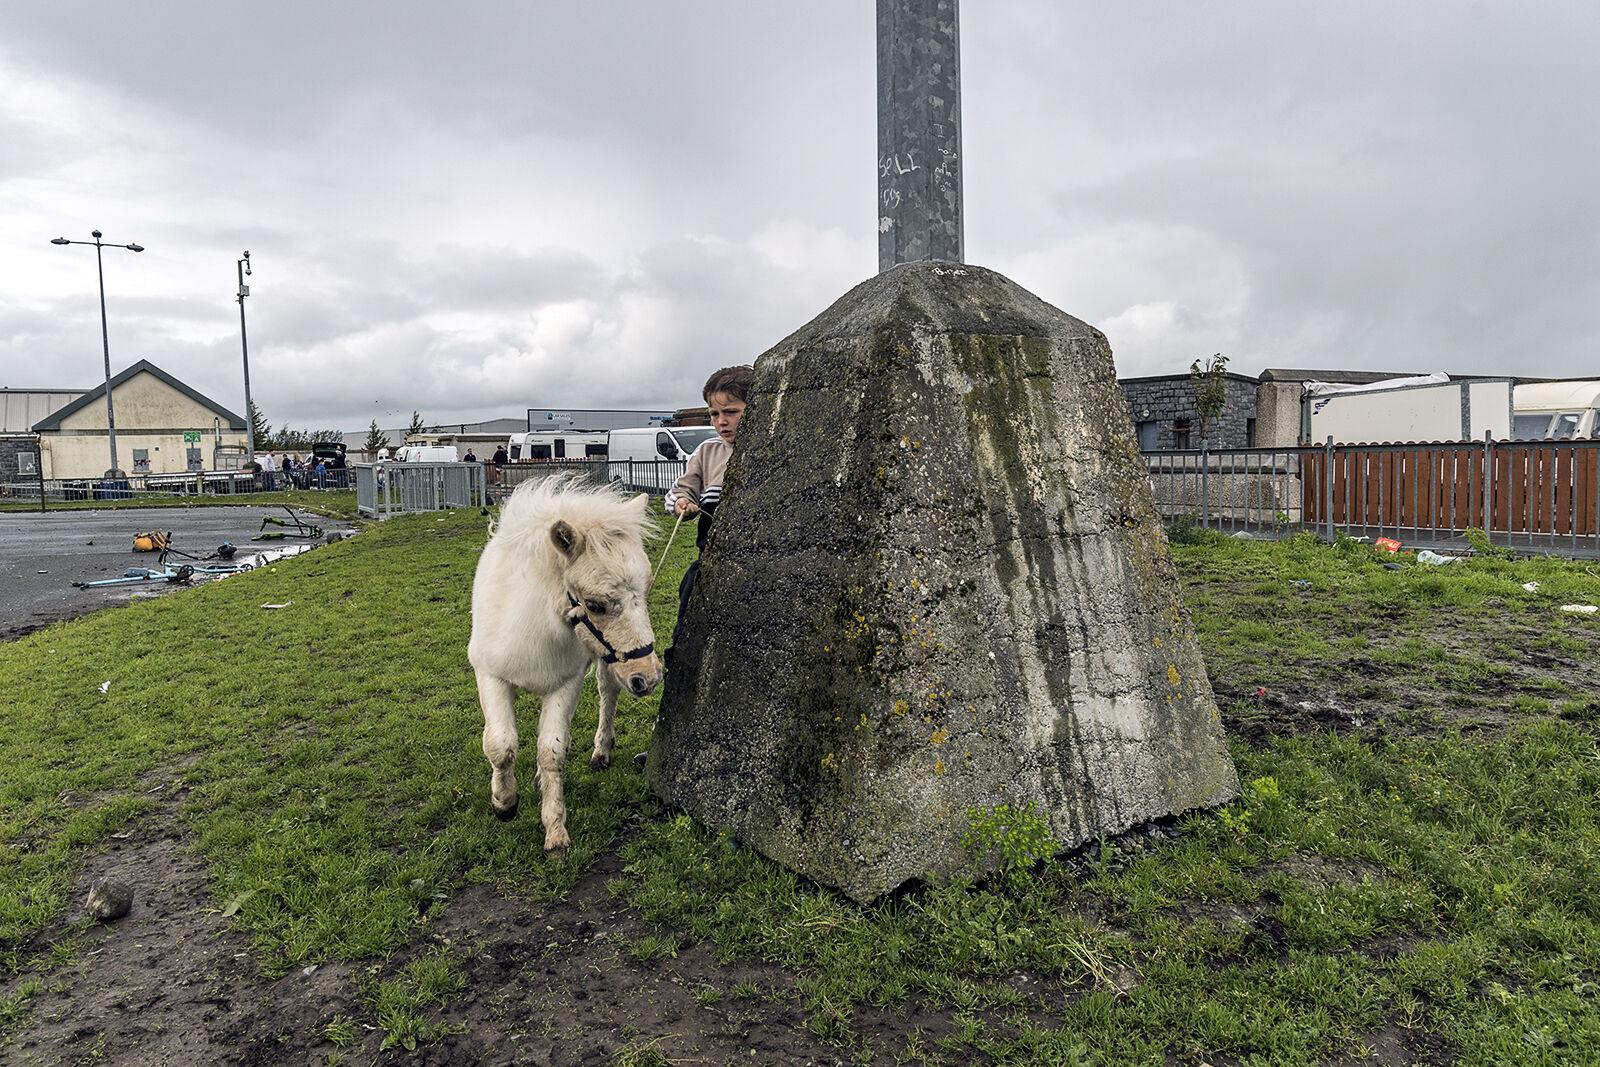 Boy and Pony around Lamp Post, Galway, Ireland 2019